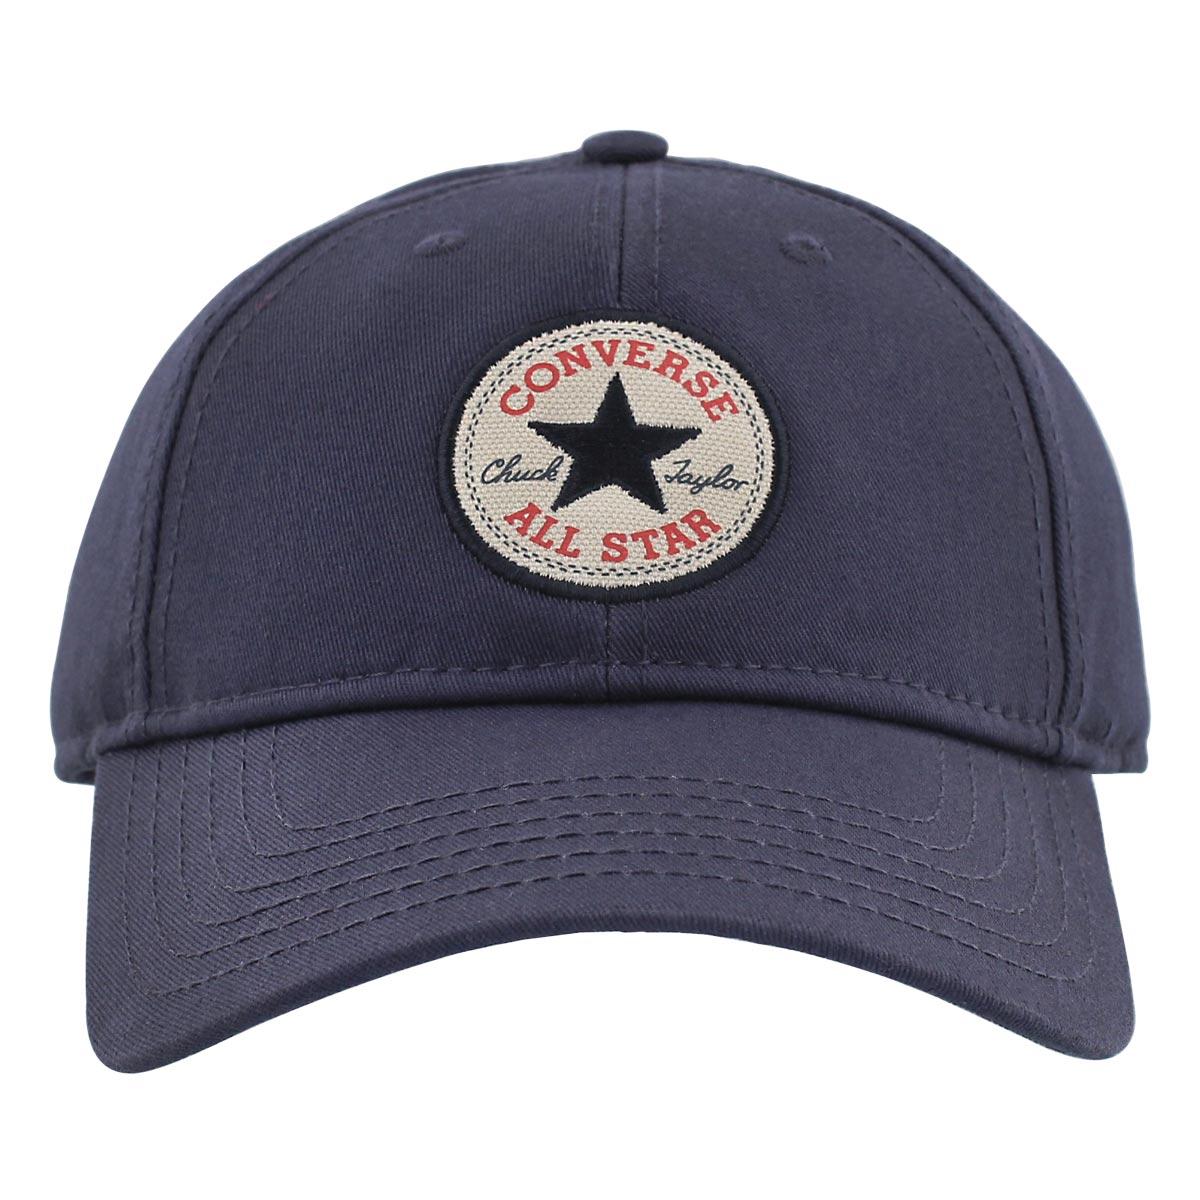 Men's CORE navy adjustable precurve caps